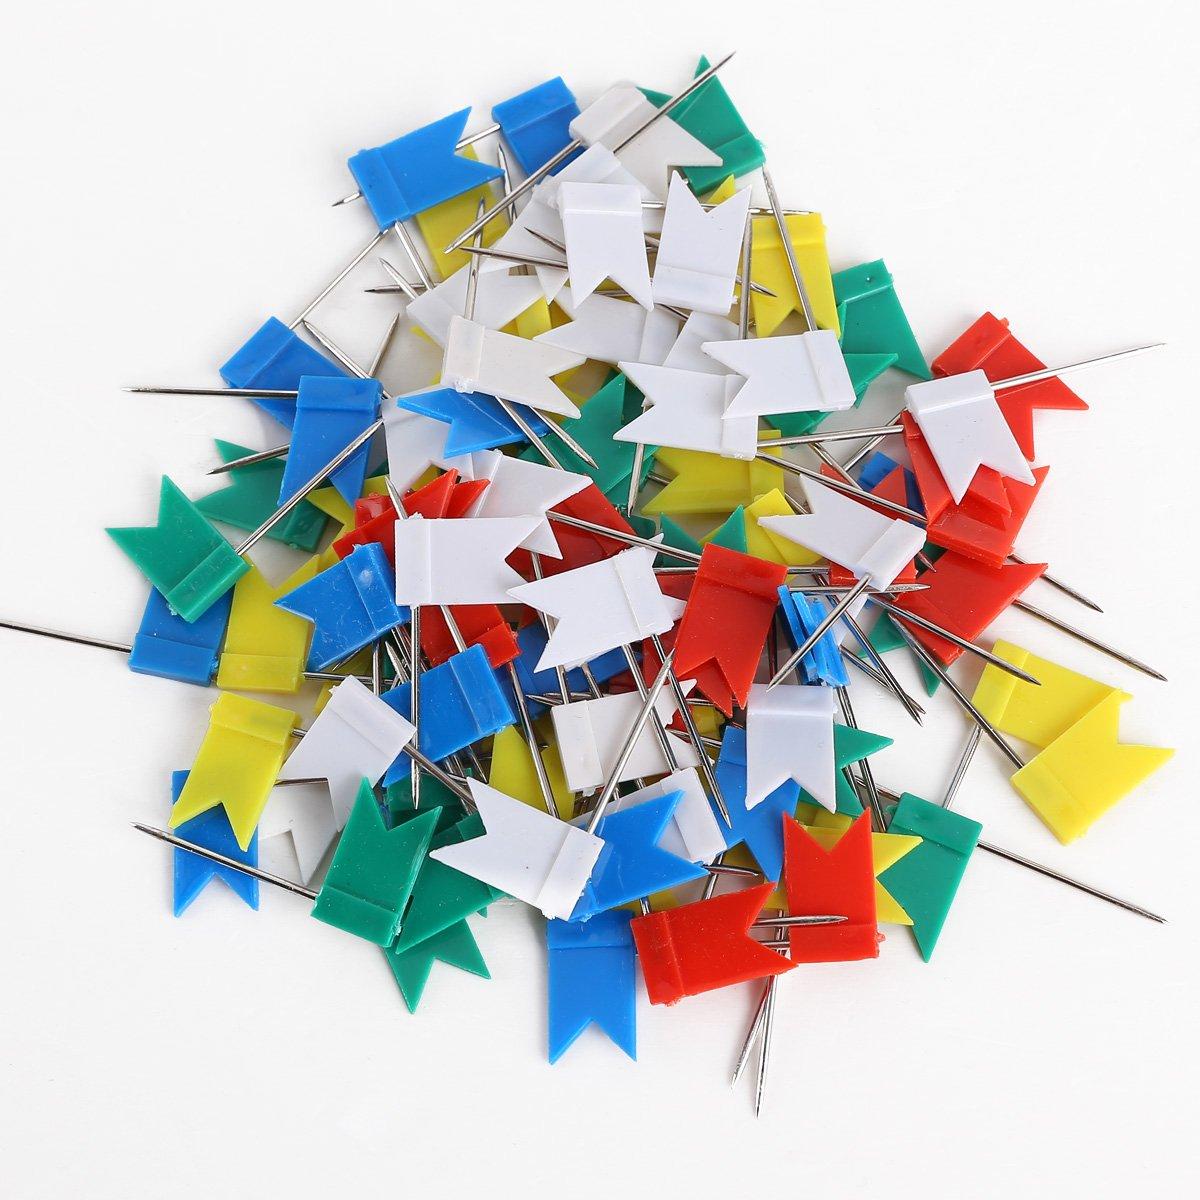 100 x Stecknadeln Landkartennadeln Pinwandnadeln Flagge bunt gemischt F/ähnchen Pinnwandmarkierung Markierungsf/ähnchen Markierungsnadeln B/üro Reise Ziel